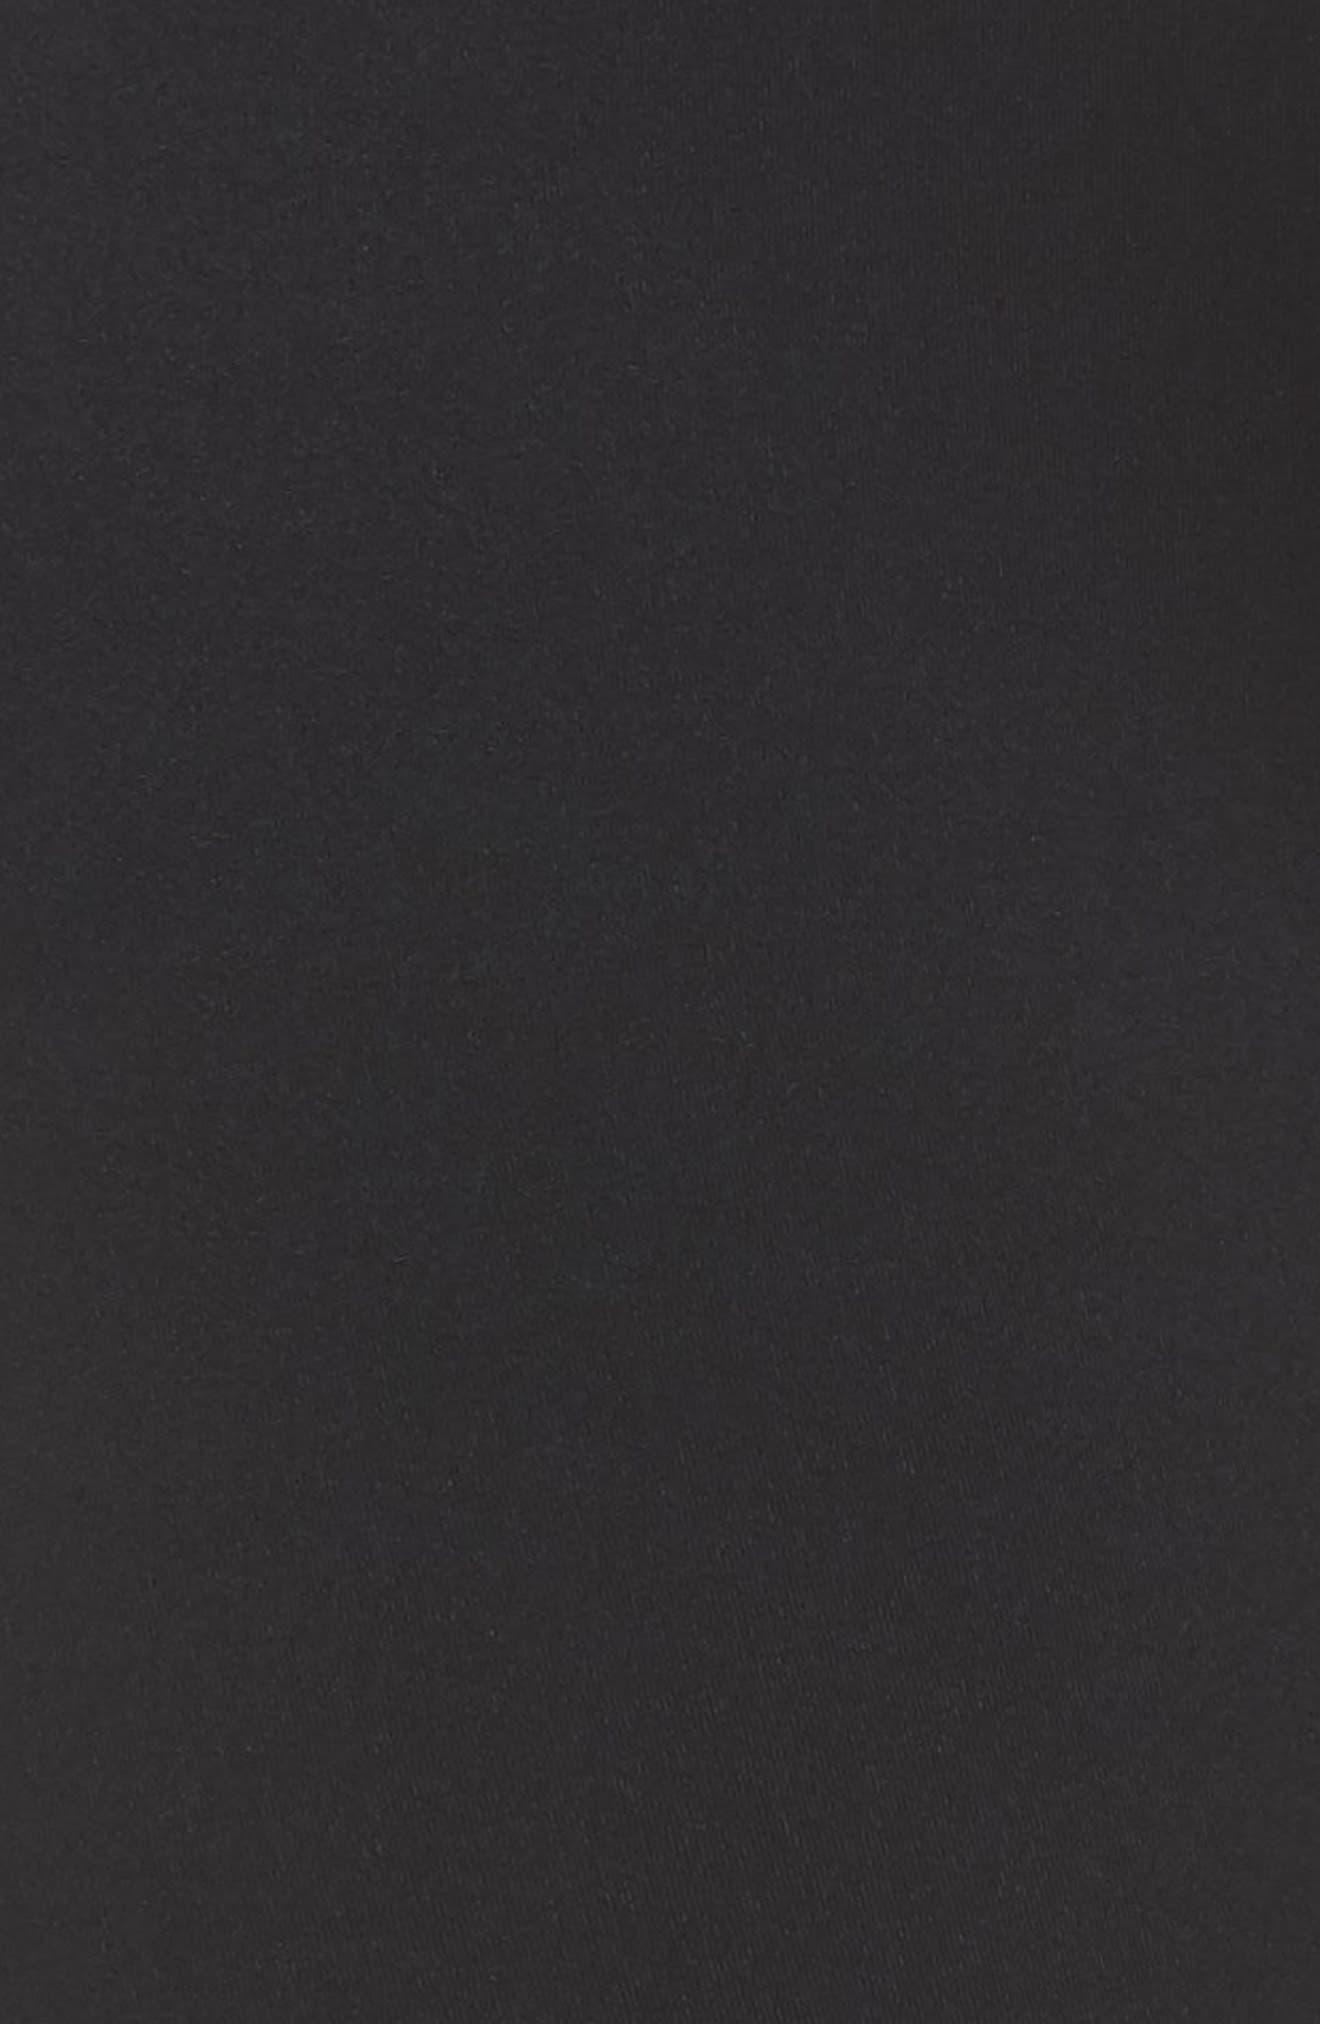 Venice Leggings,                             Alternate thumbnail 6, color,                             BLACK/ ROYAL/ OFF WHITE